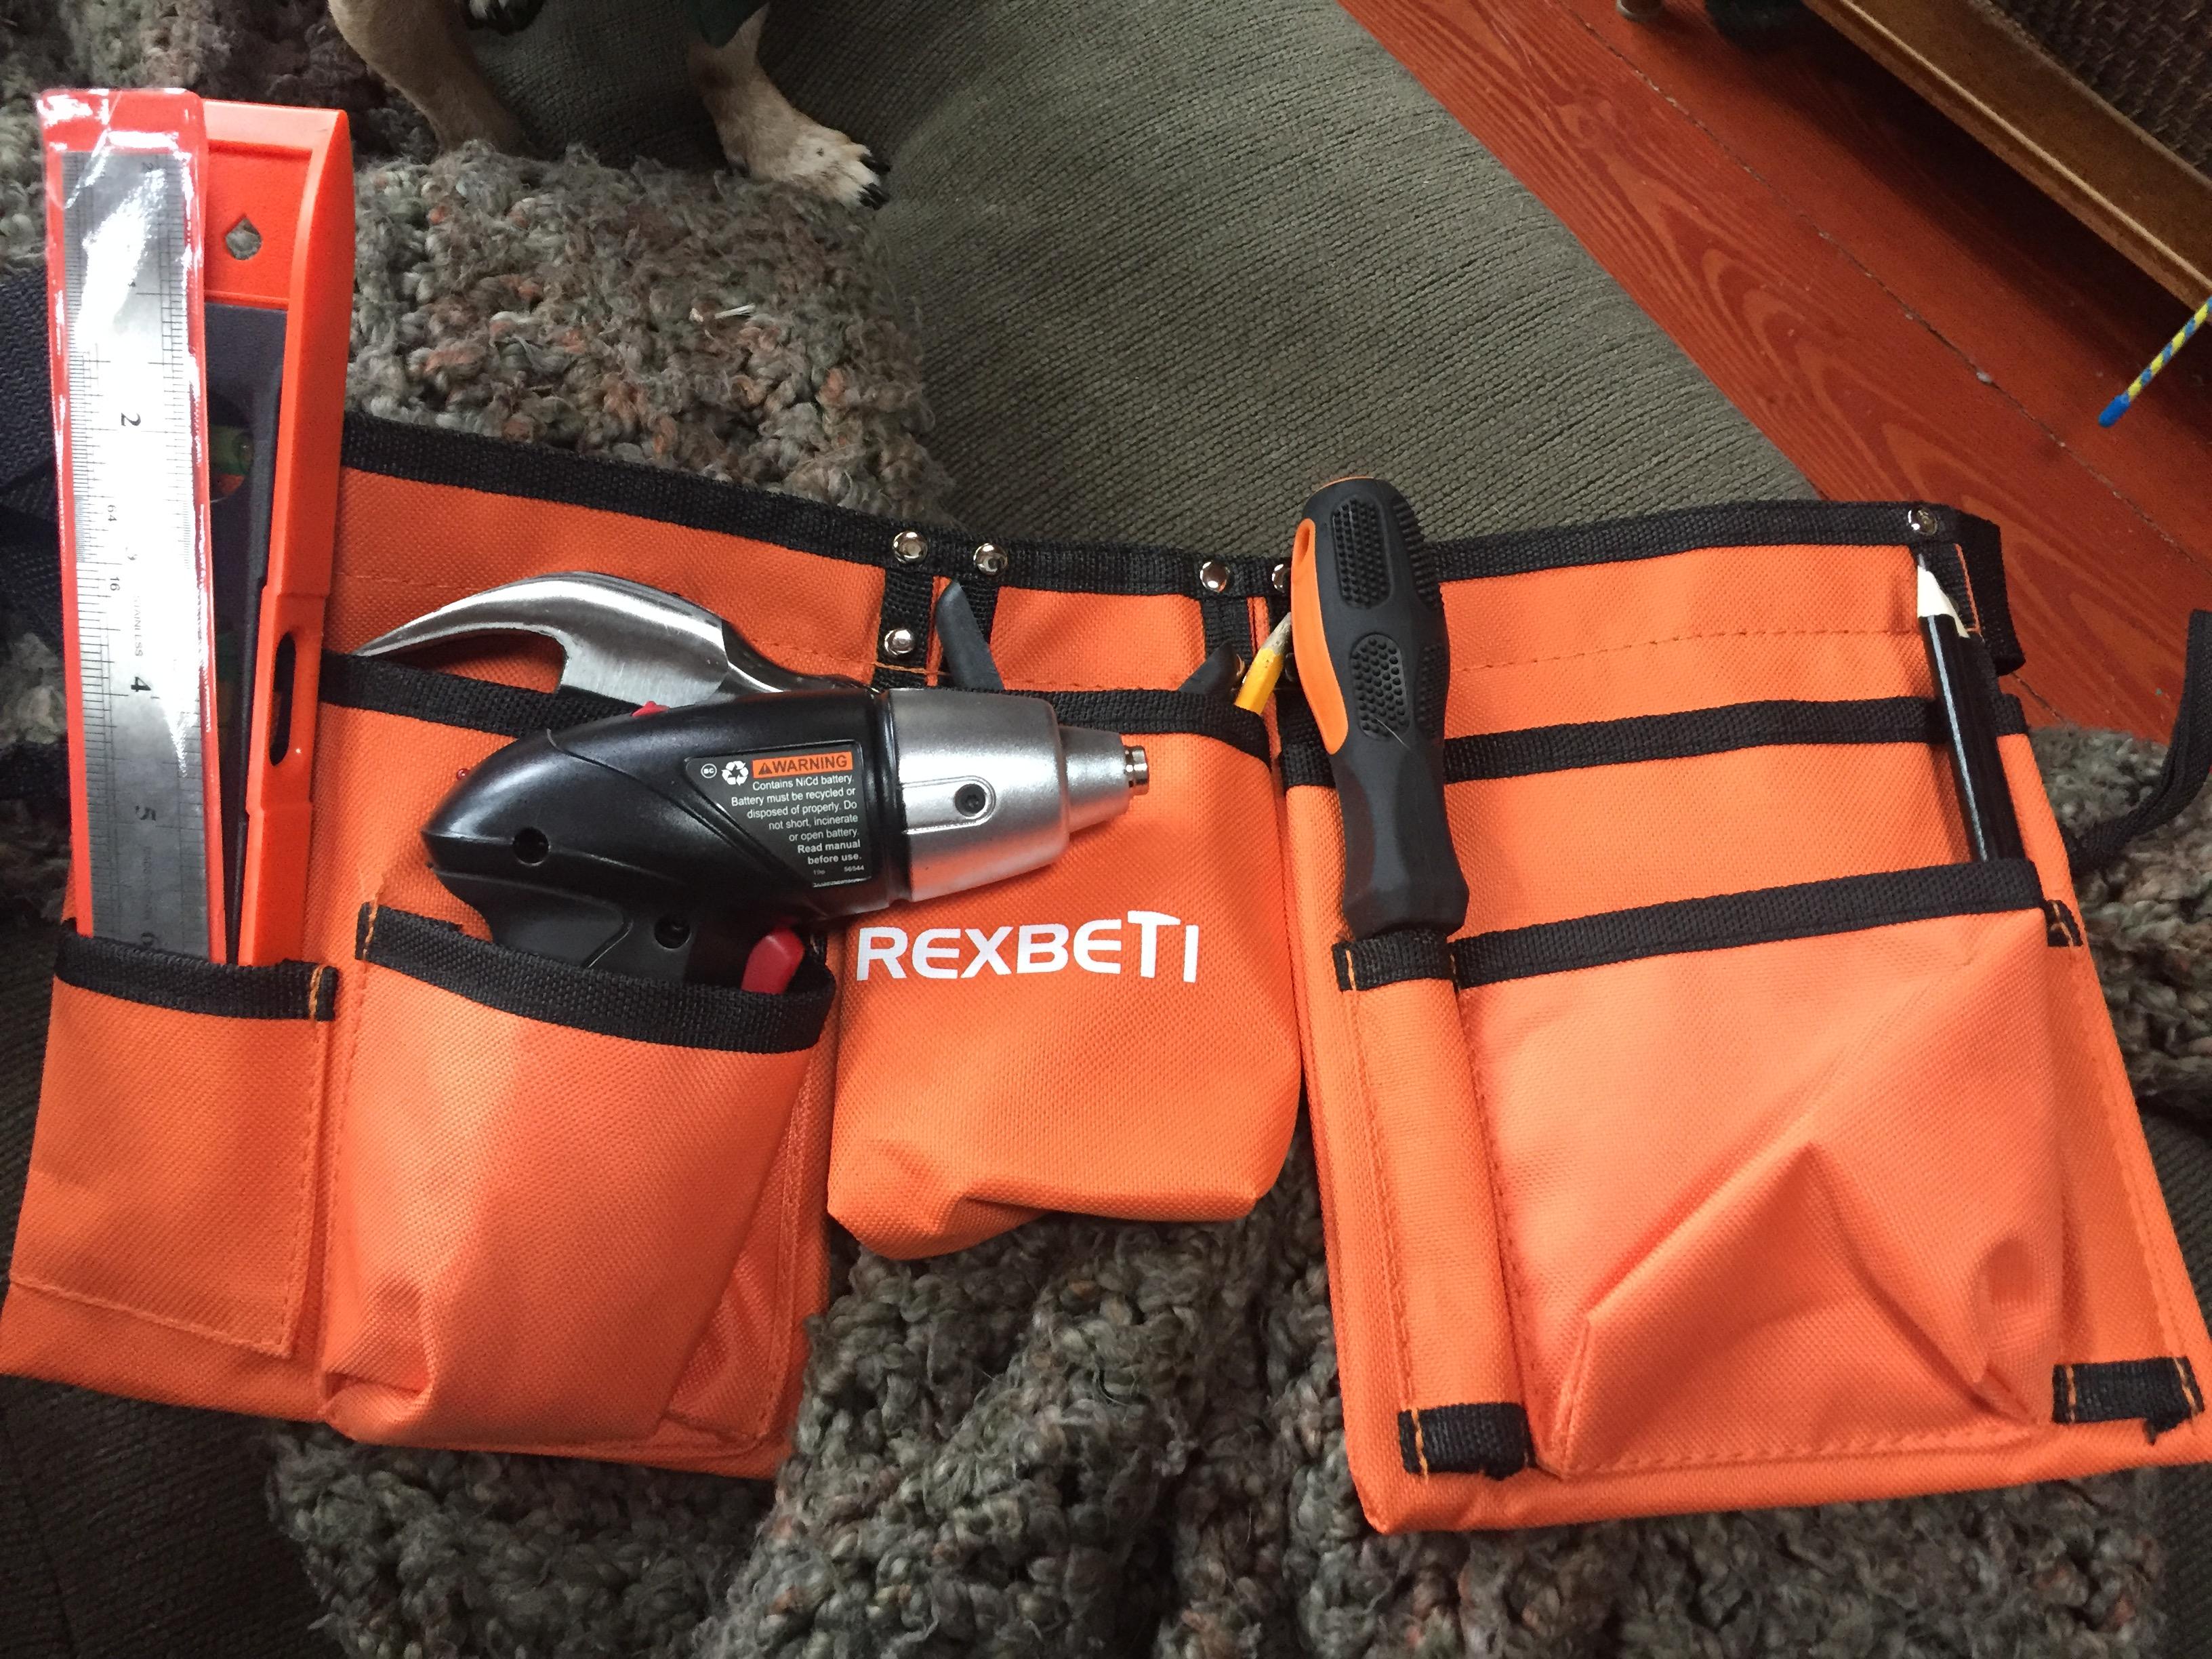 Rexbeti 15 piece kids tool set in orange adjustable tool belt